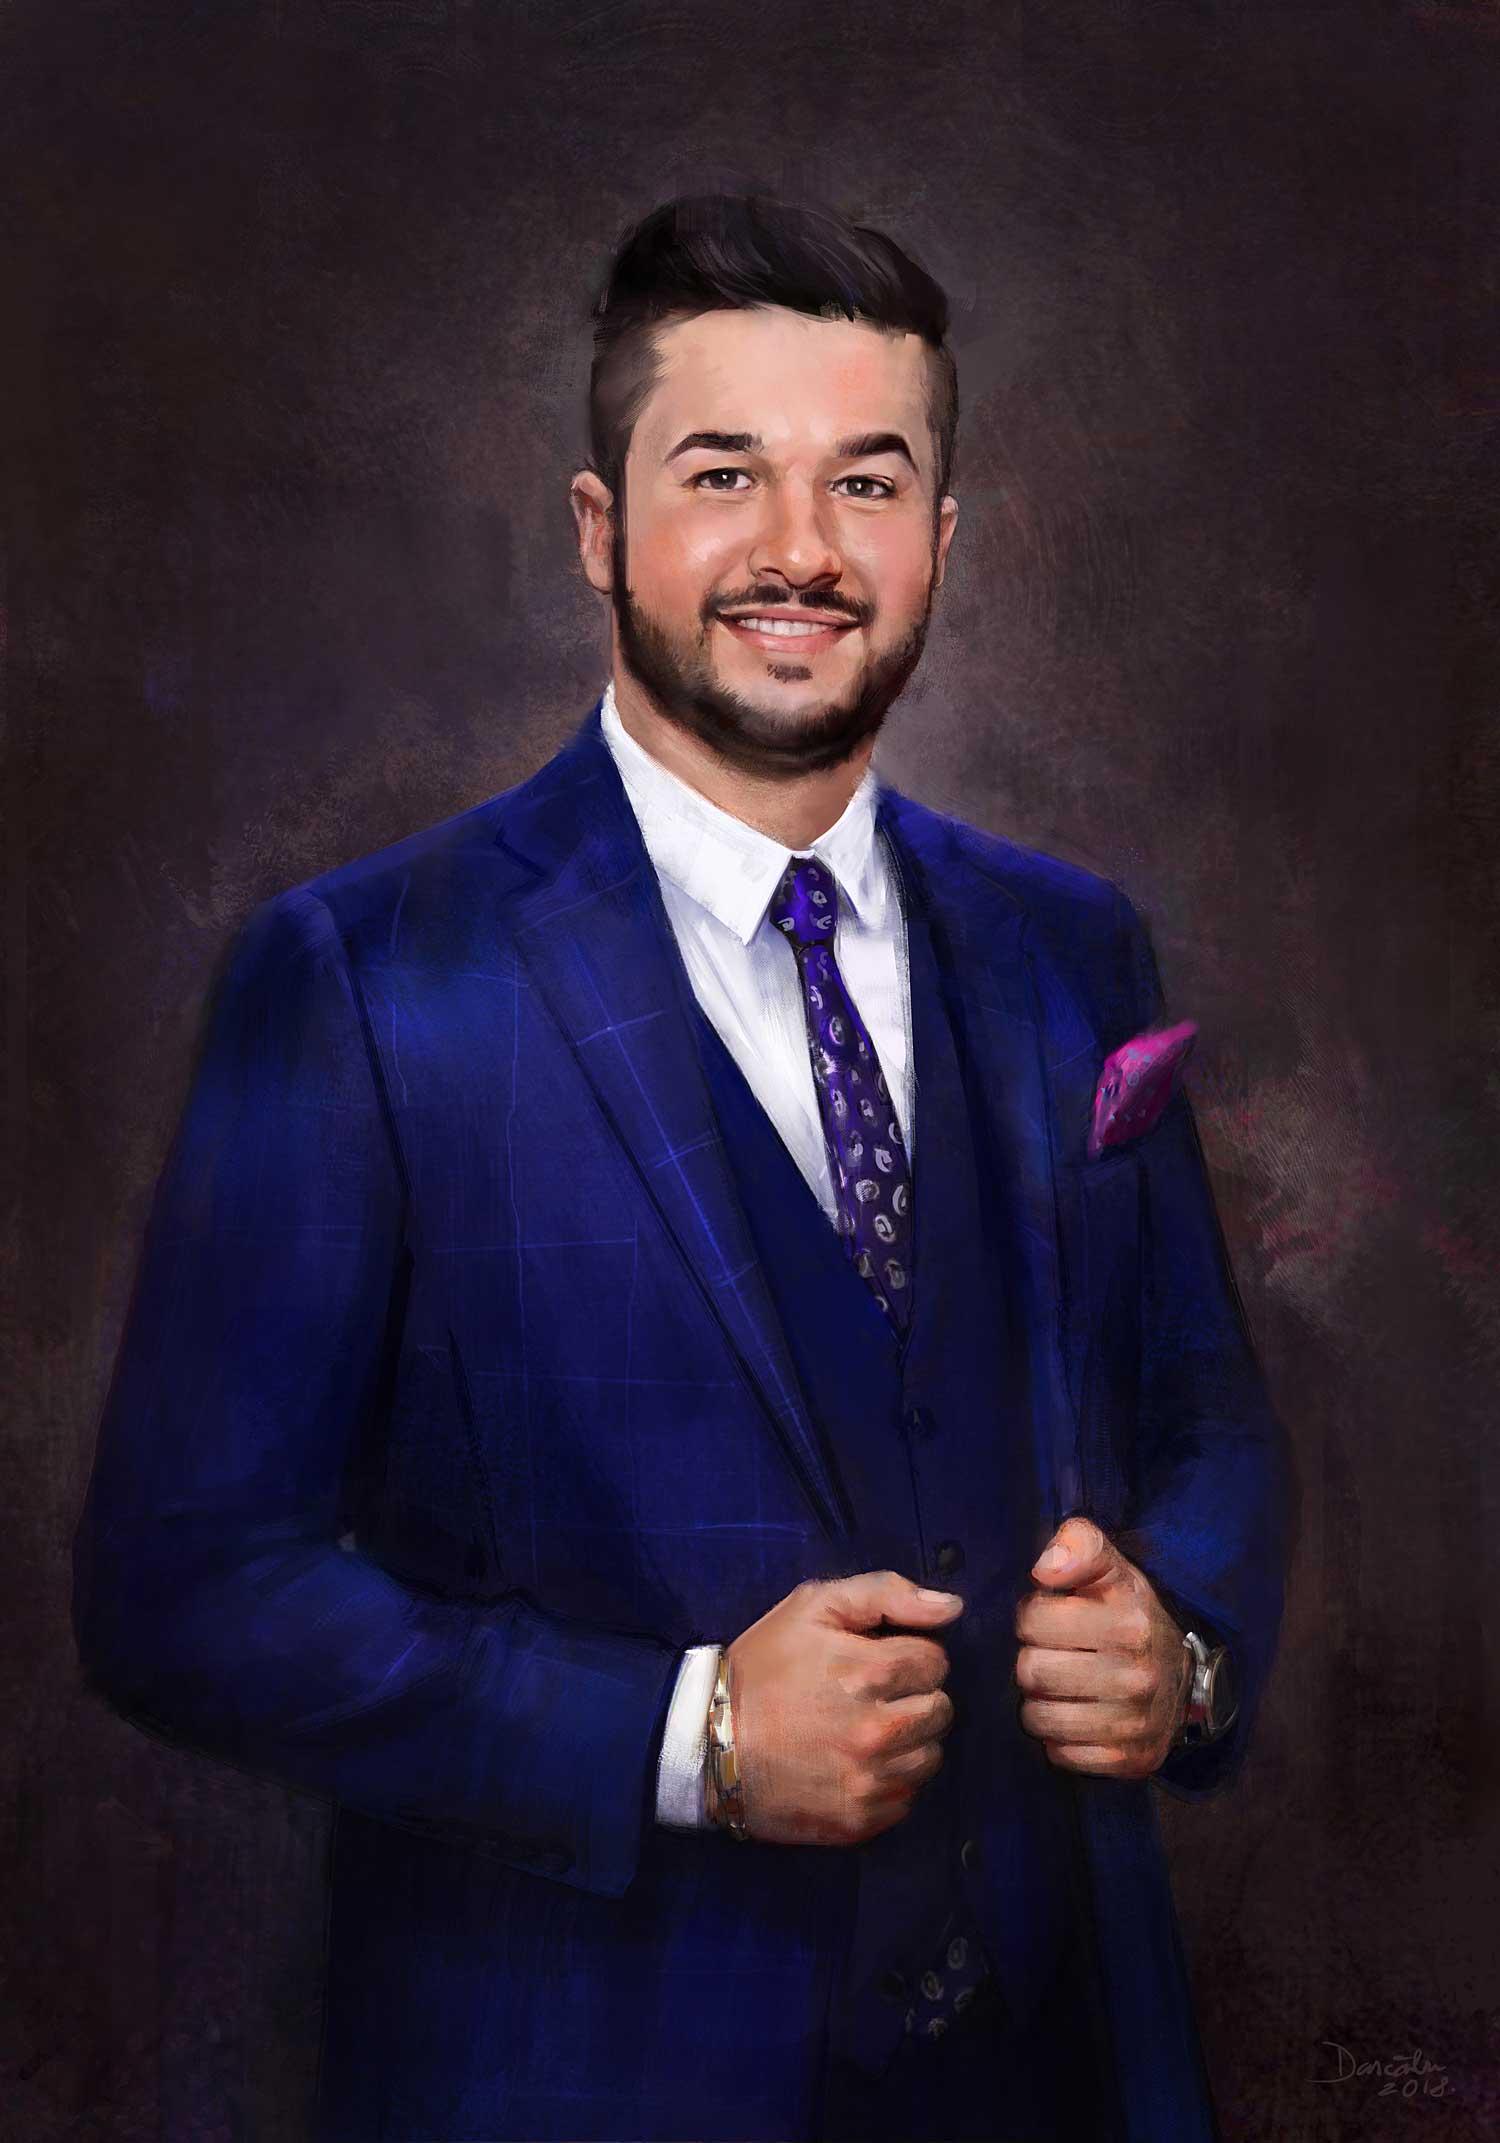 Digital portrait of young man in elegant blue costume